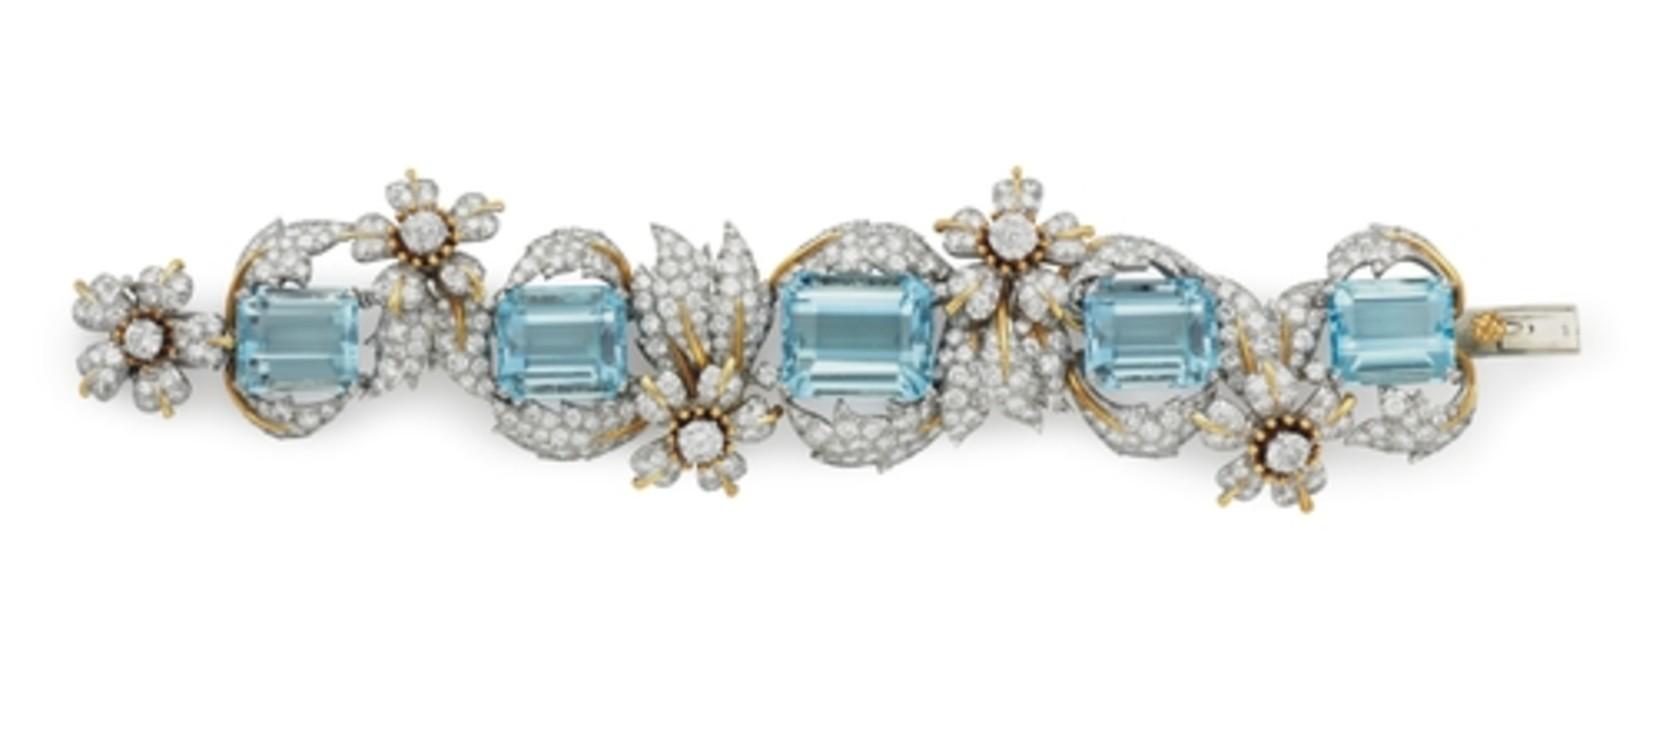 Браслет з платини і золота з аквамаринами Tiffany & Co.